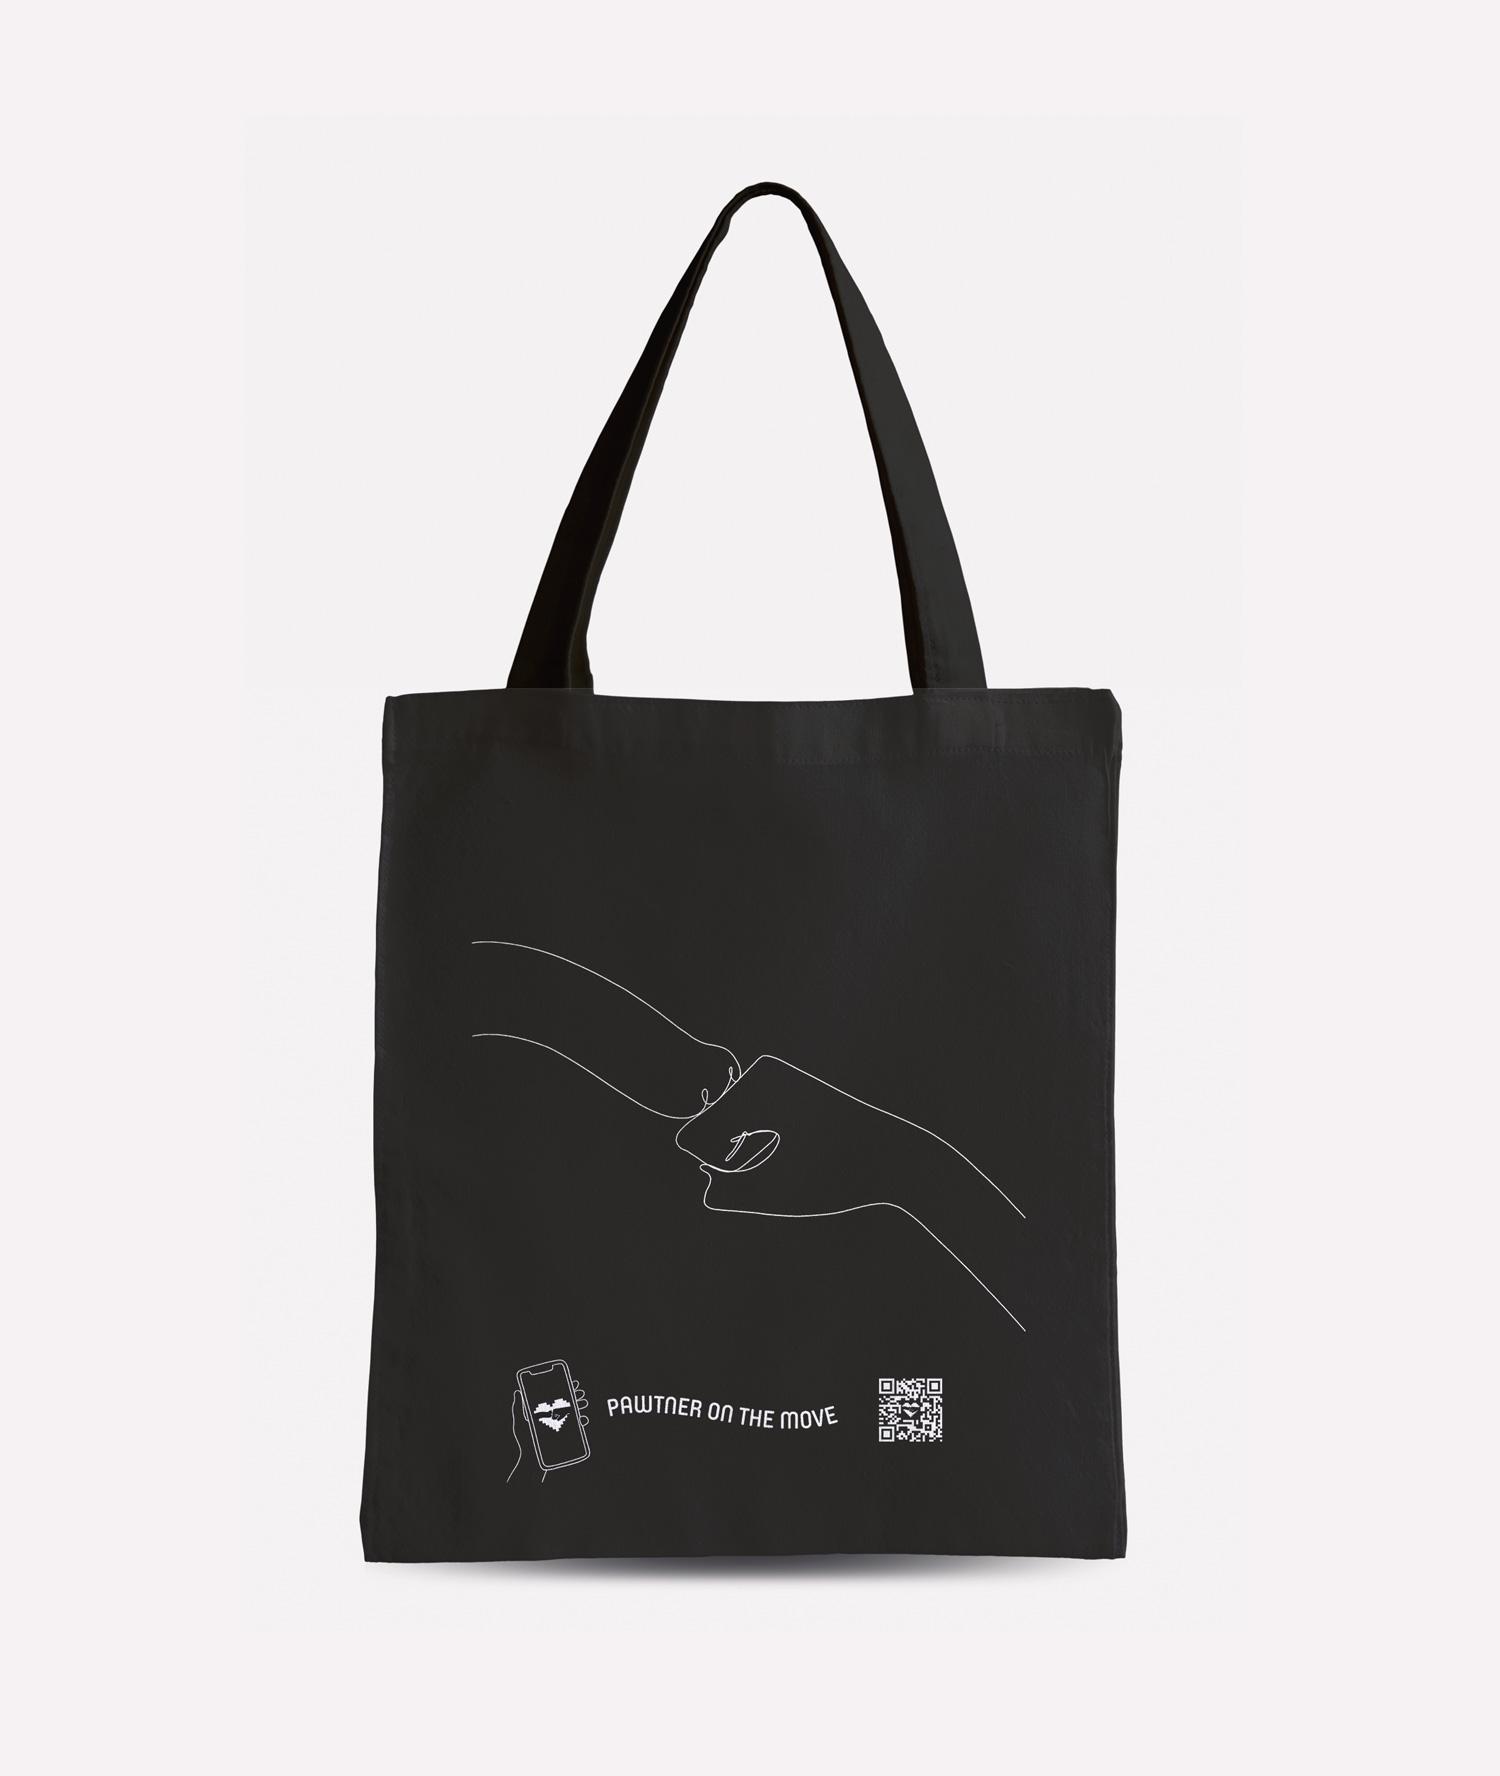 bag_mock_up_dark-1500-2